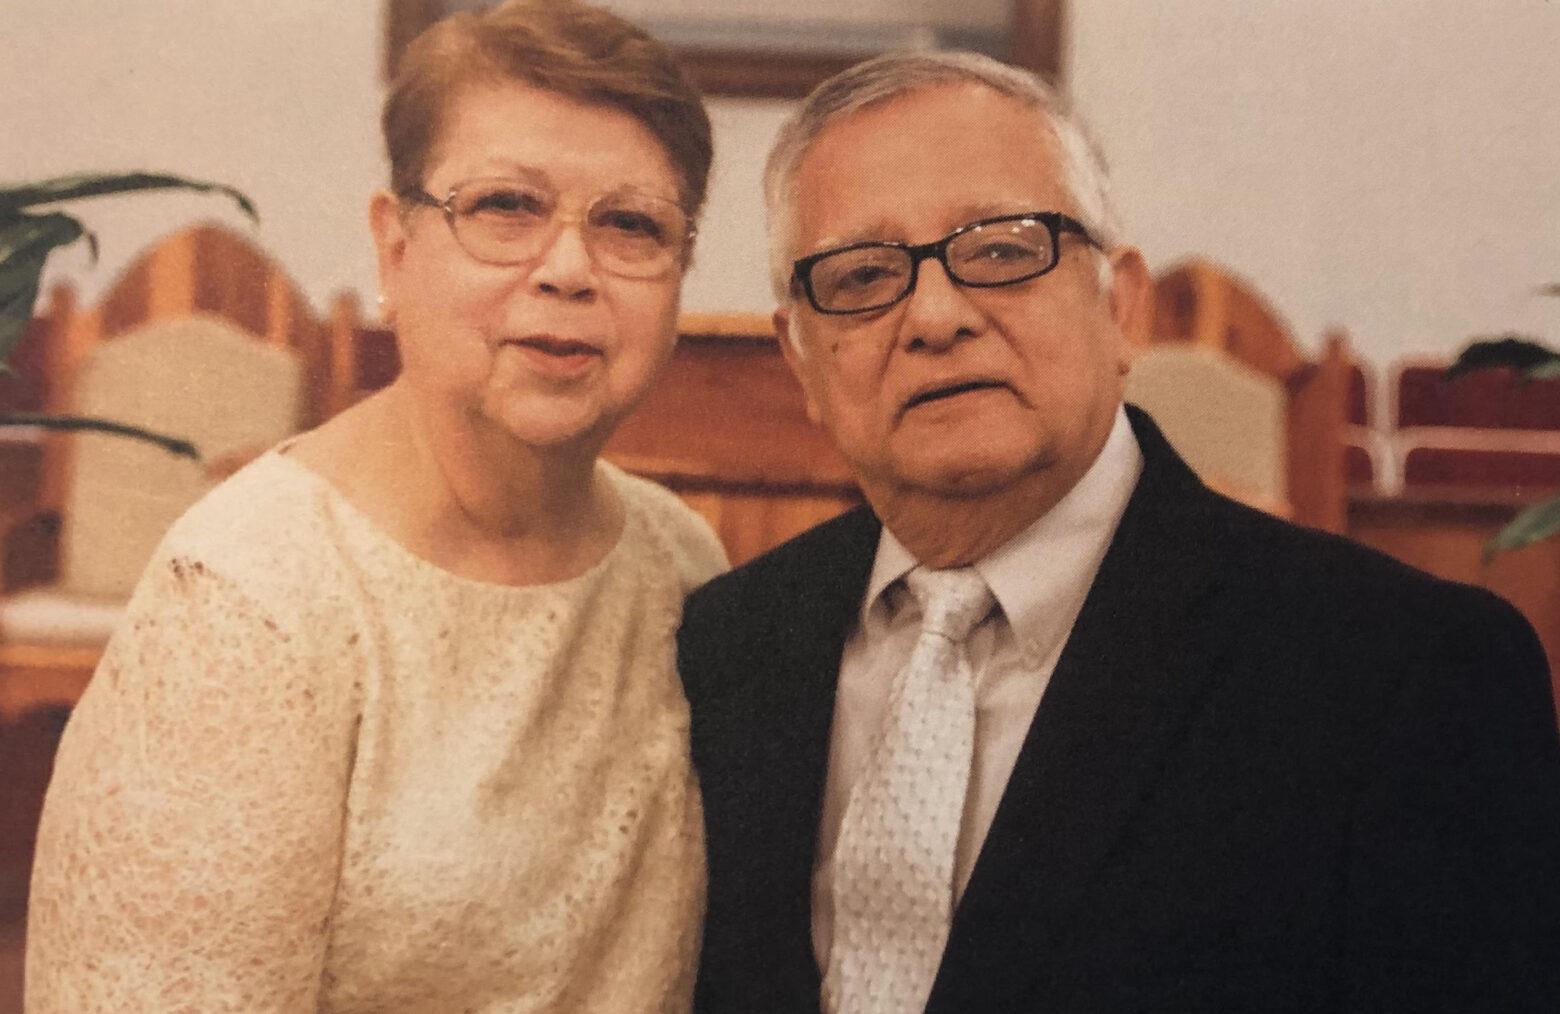 Celebration of life service for Rev. and Mrs. Hernandez set for October 16 in Hermitage